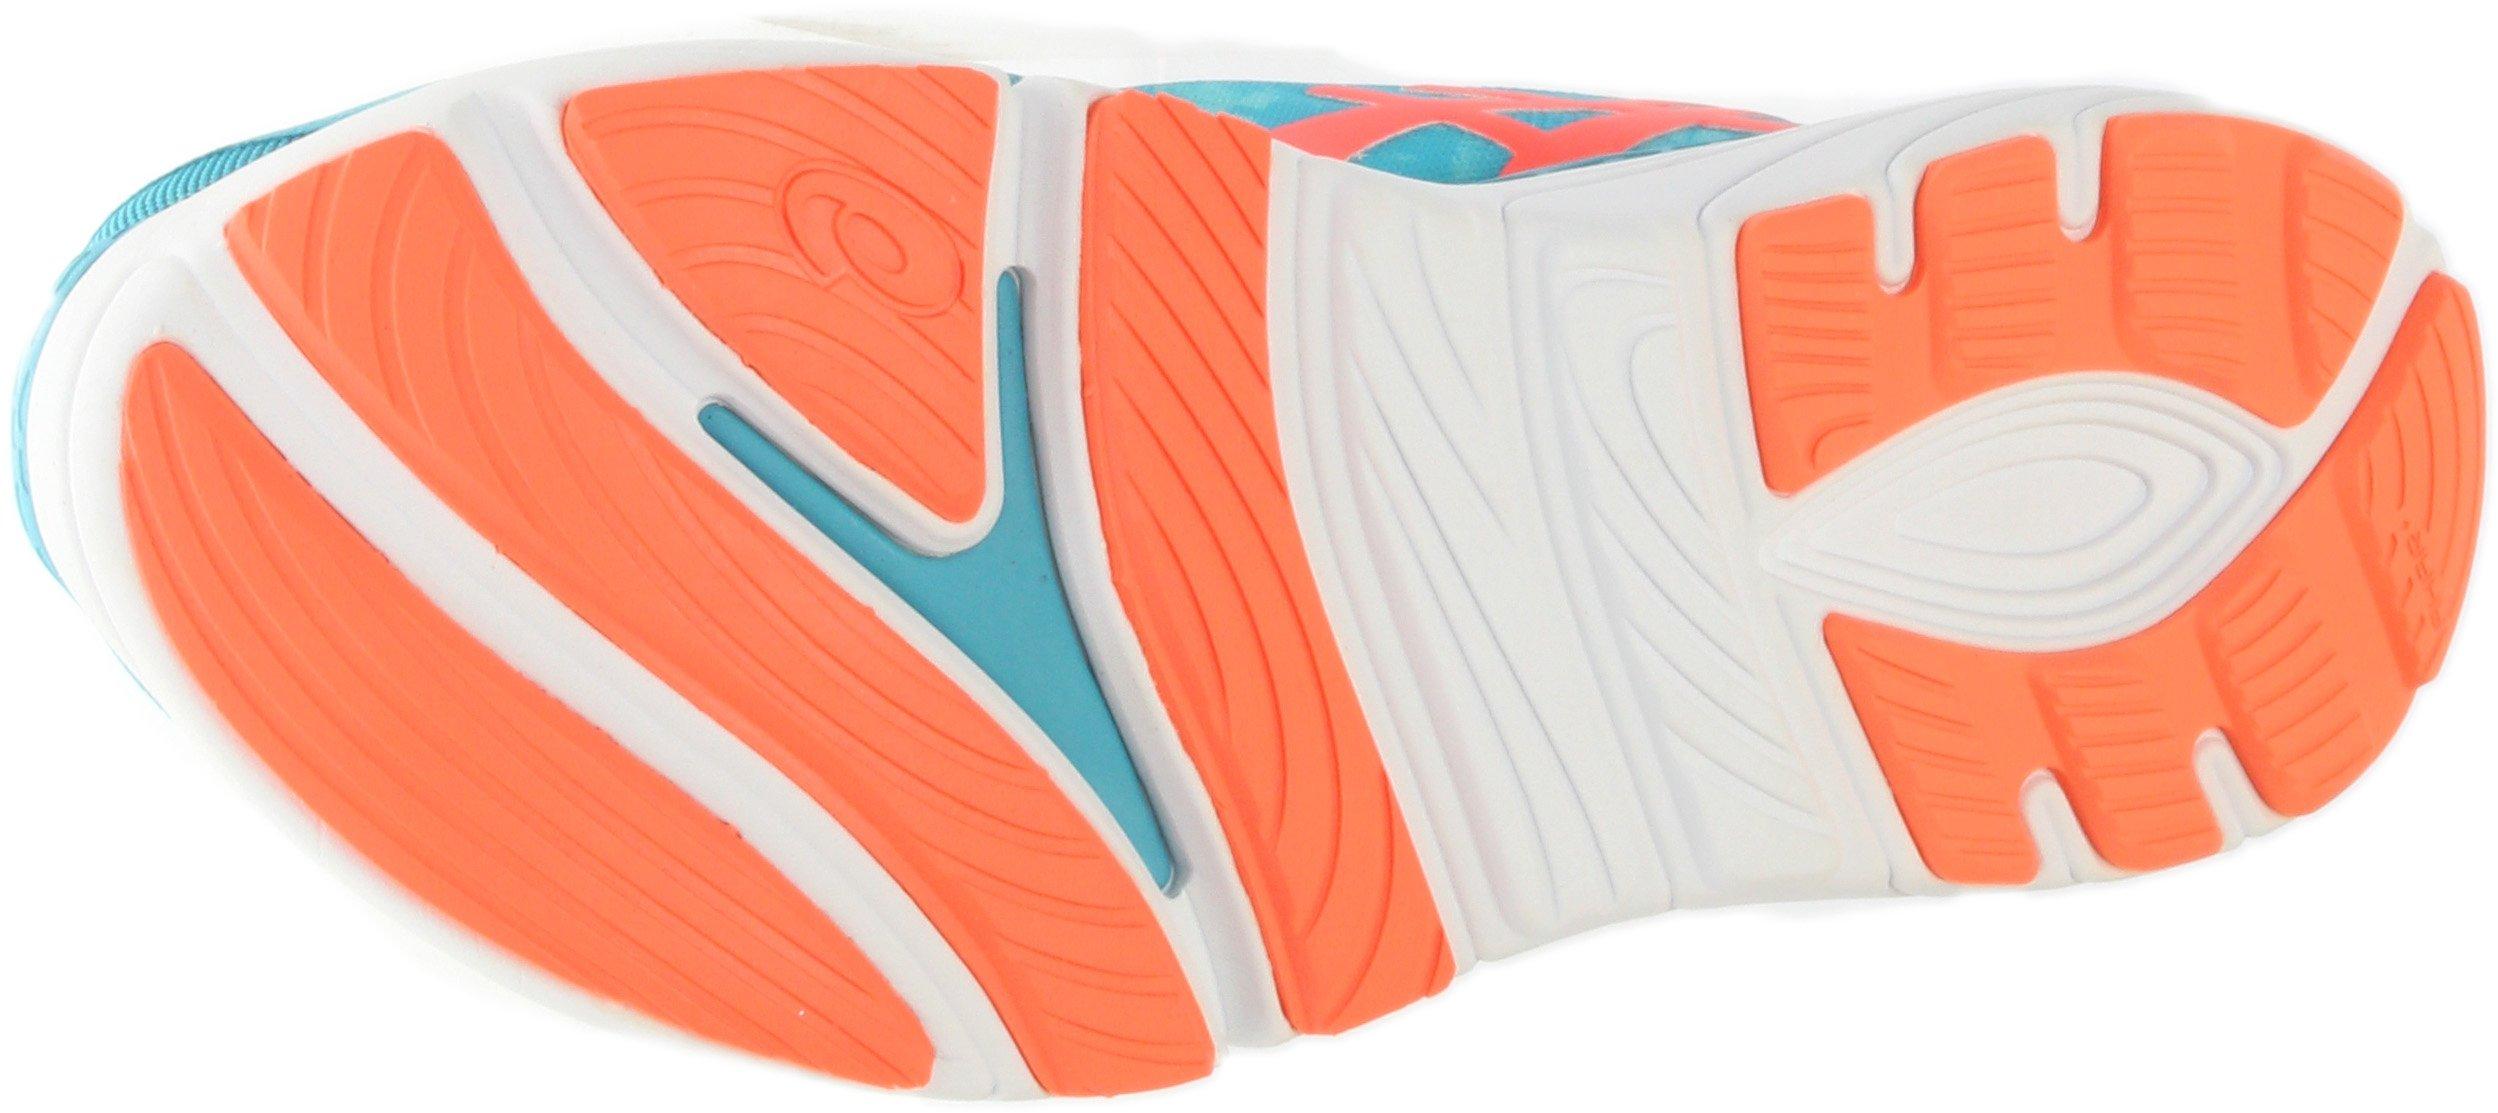 ASICS Women's 33-M 2 Running Shoe, Aquarium/Flash Coral/Aruba Blue, 9.5 M US by ASICS (Image #7)